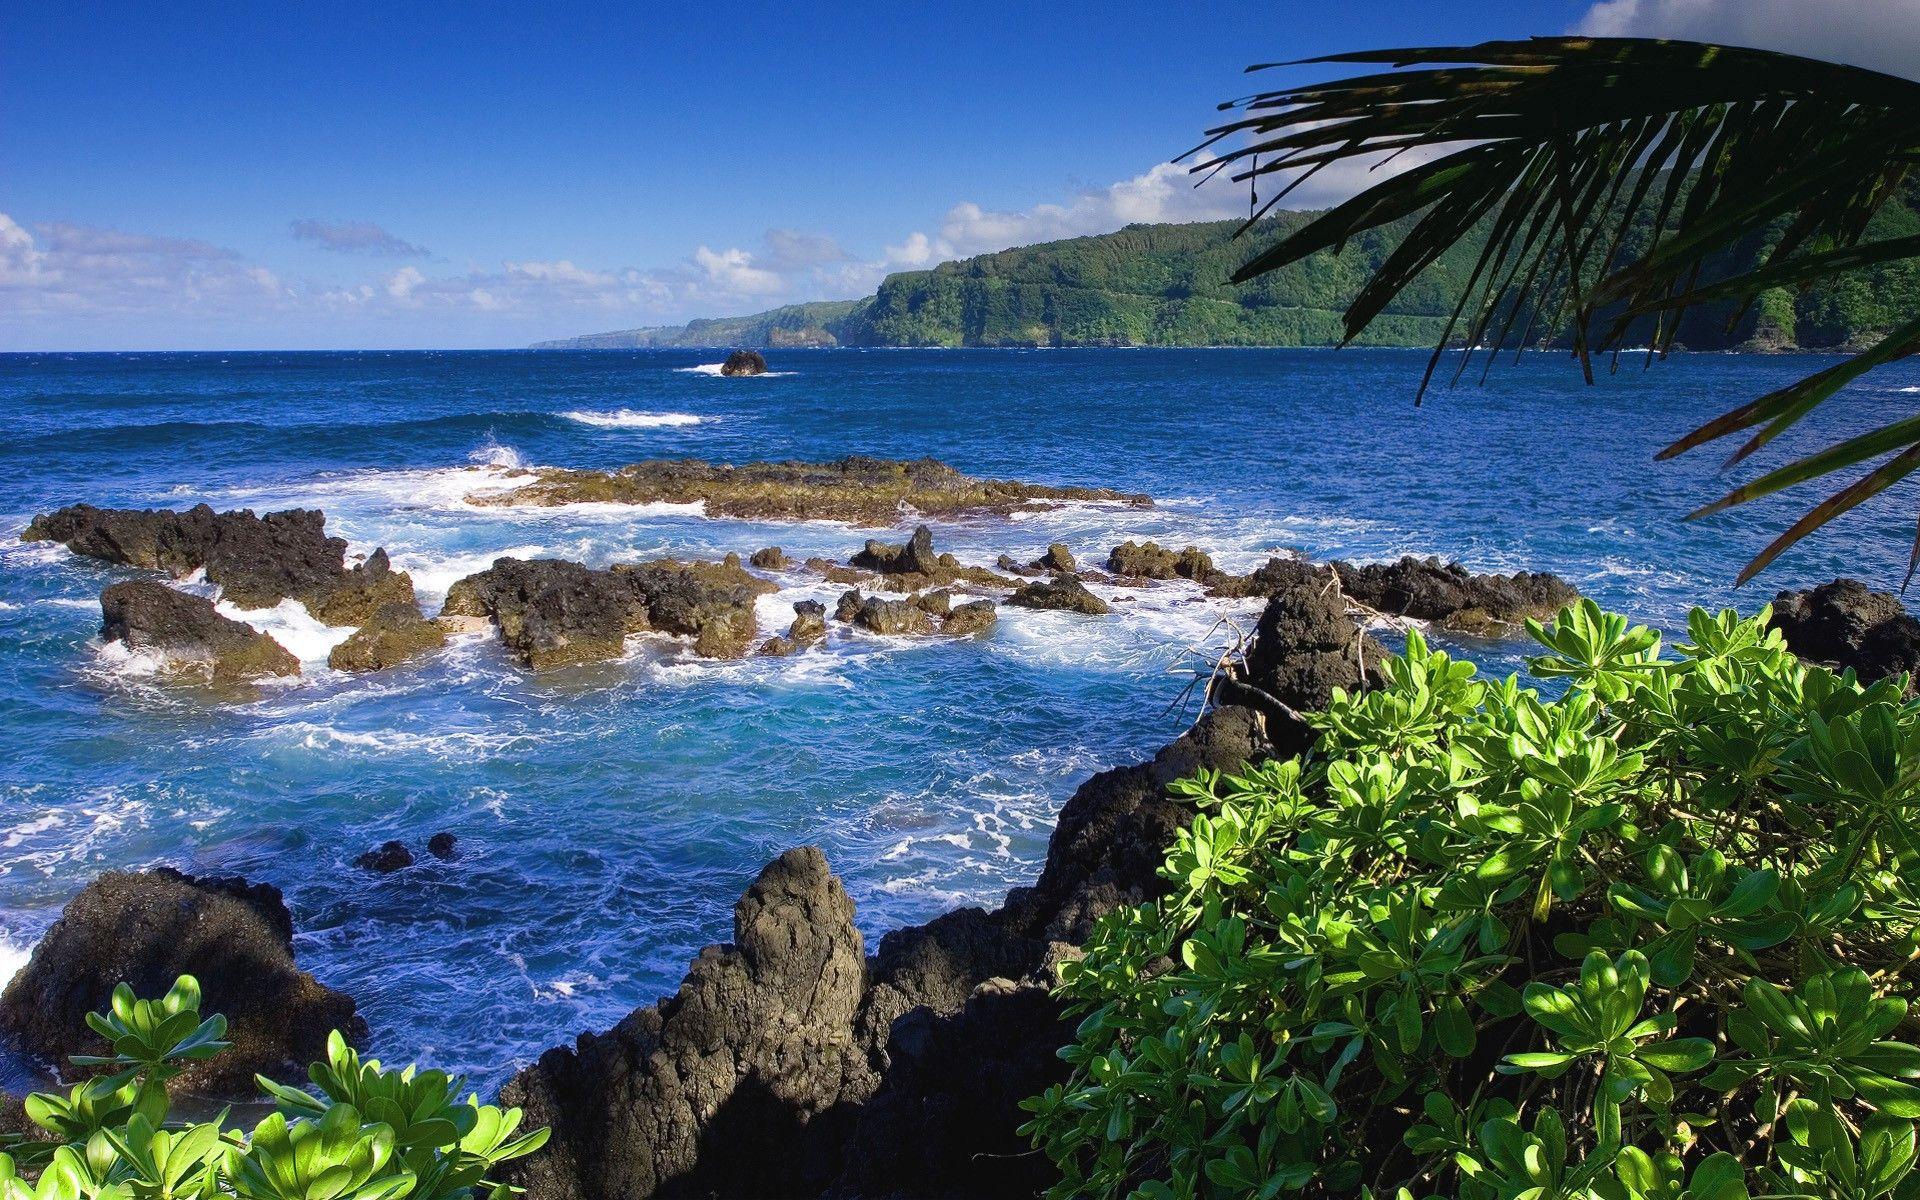 ocean coastline from the shores of Maui Hawaii on the Road to Hana 1920x1200